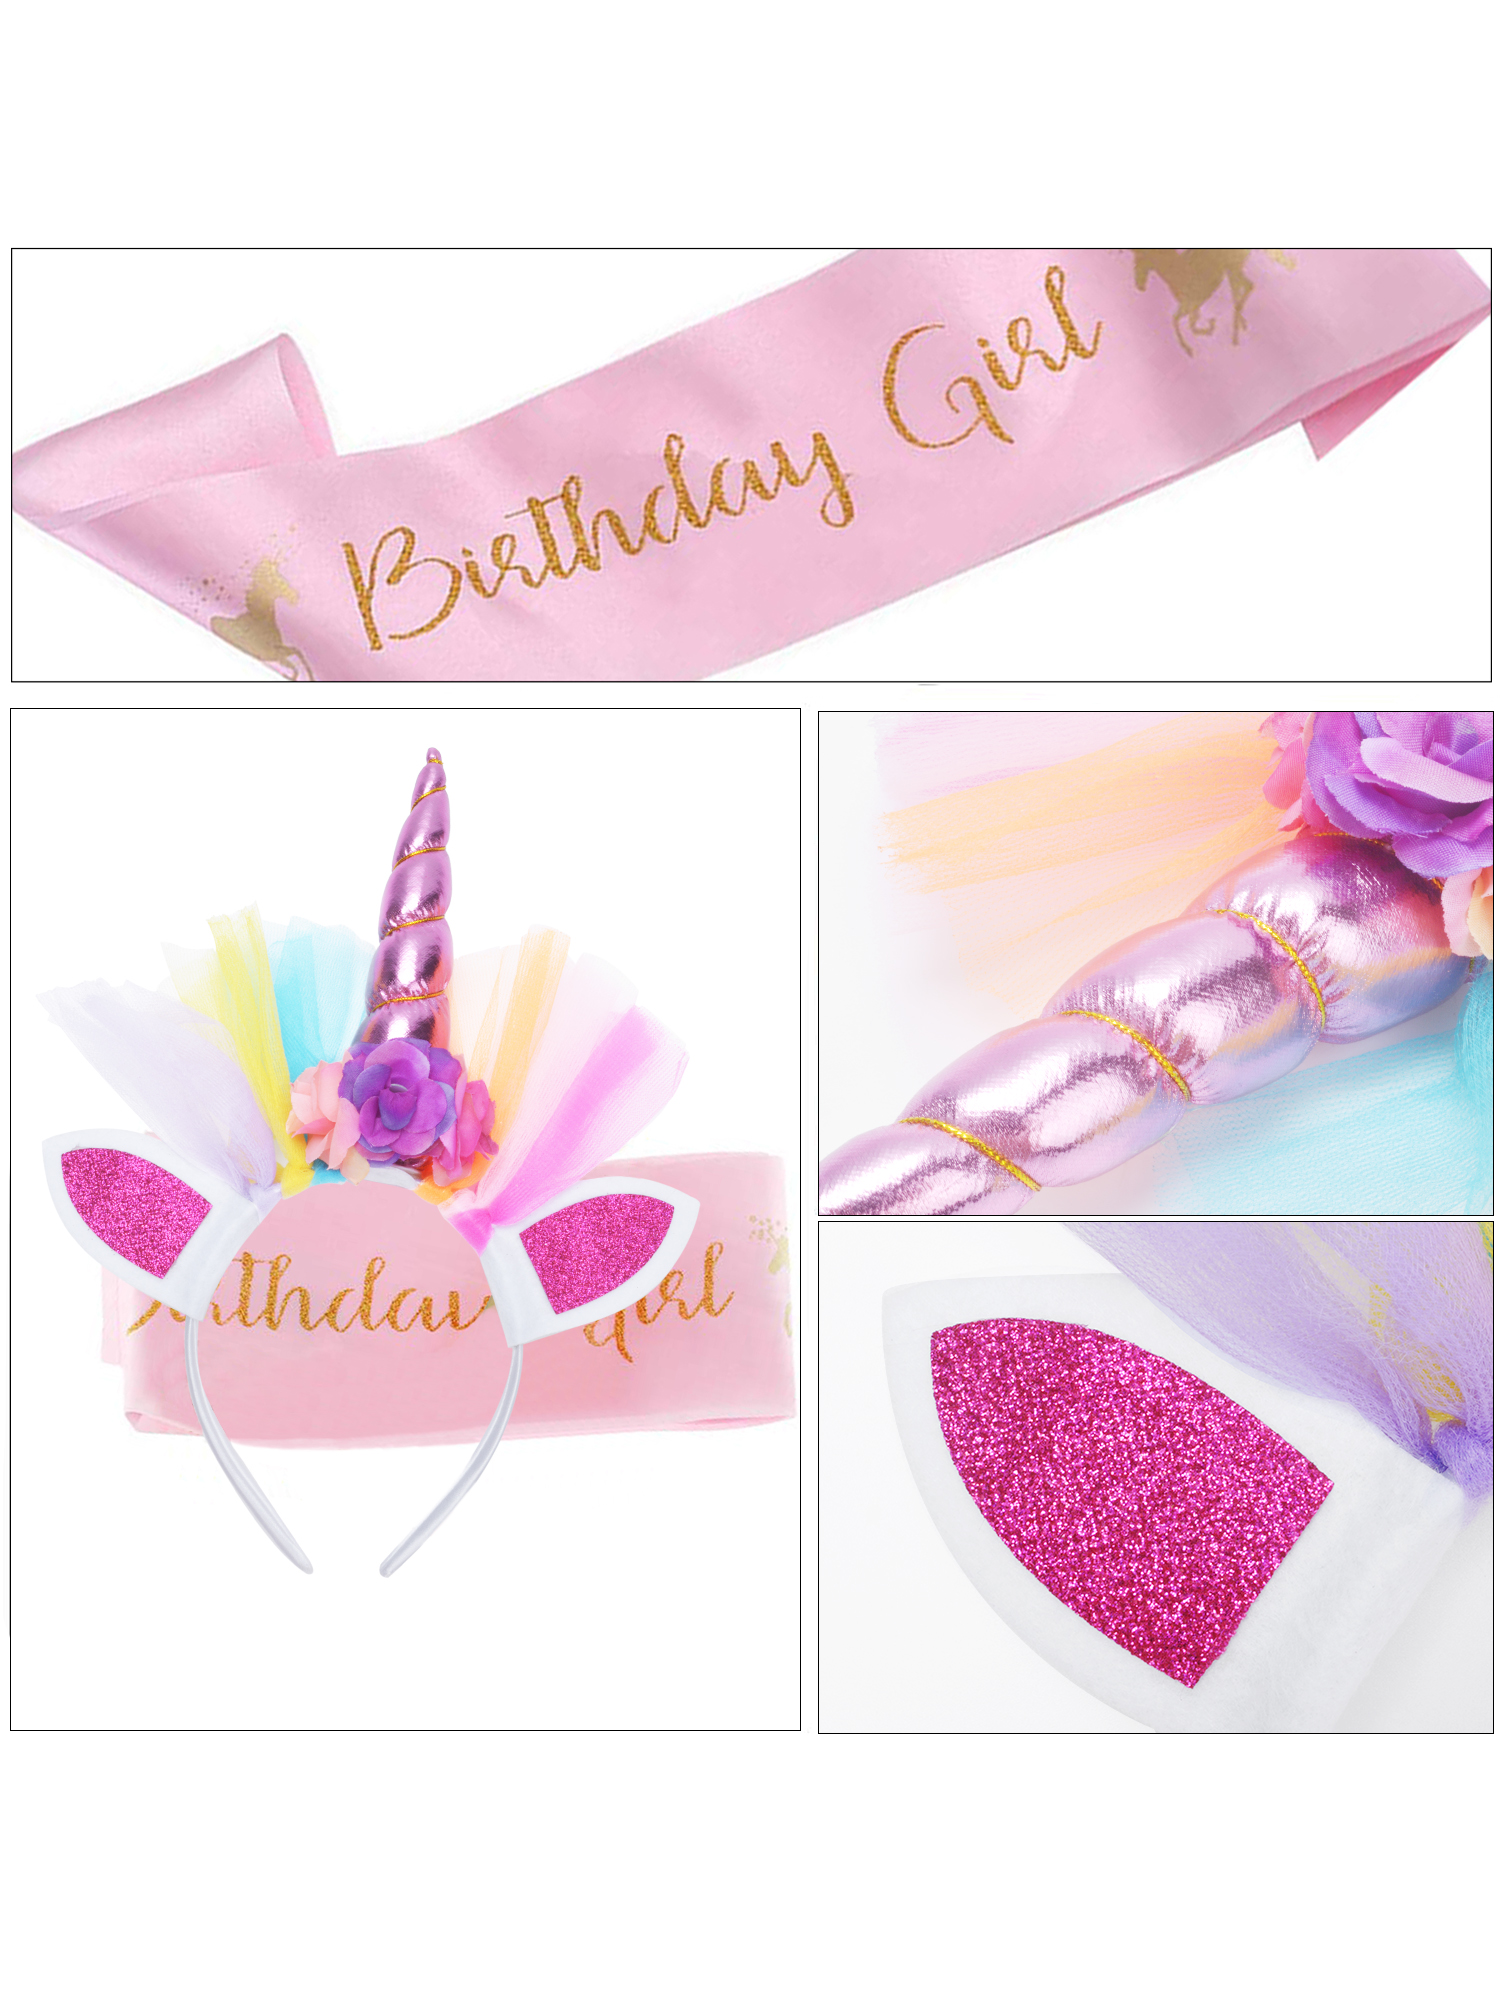 Unicorn Happy Birthday Girl Set of Gold Glitter Unicorn Headband Pink Satin Sash for Girls Happy Birthday Unicorn Party Favors Supplies Theme Decorations